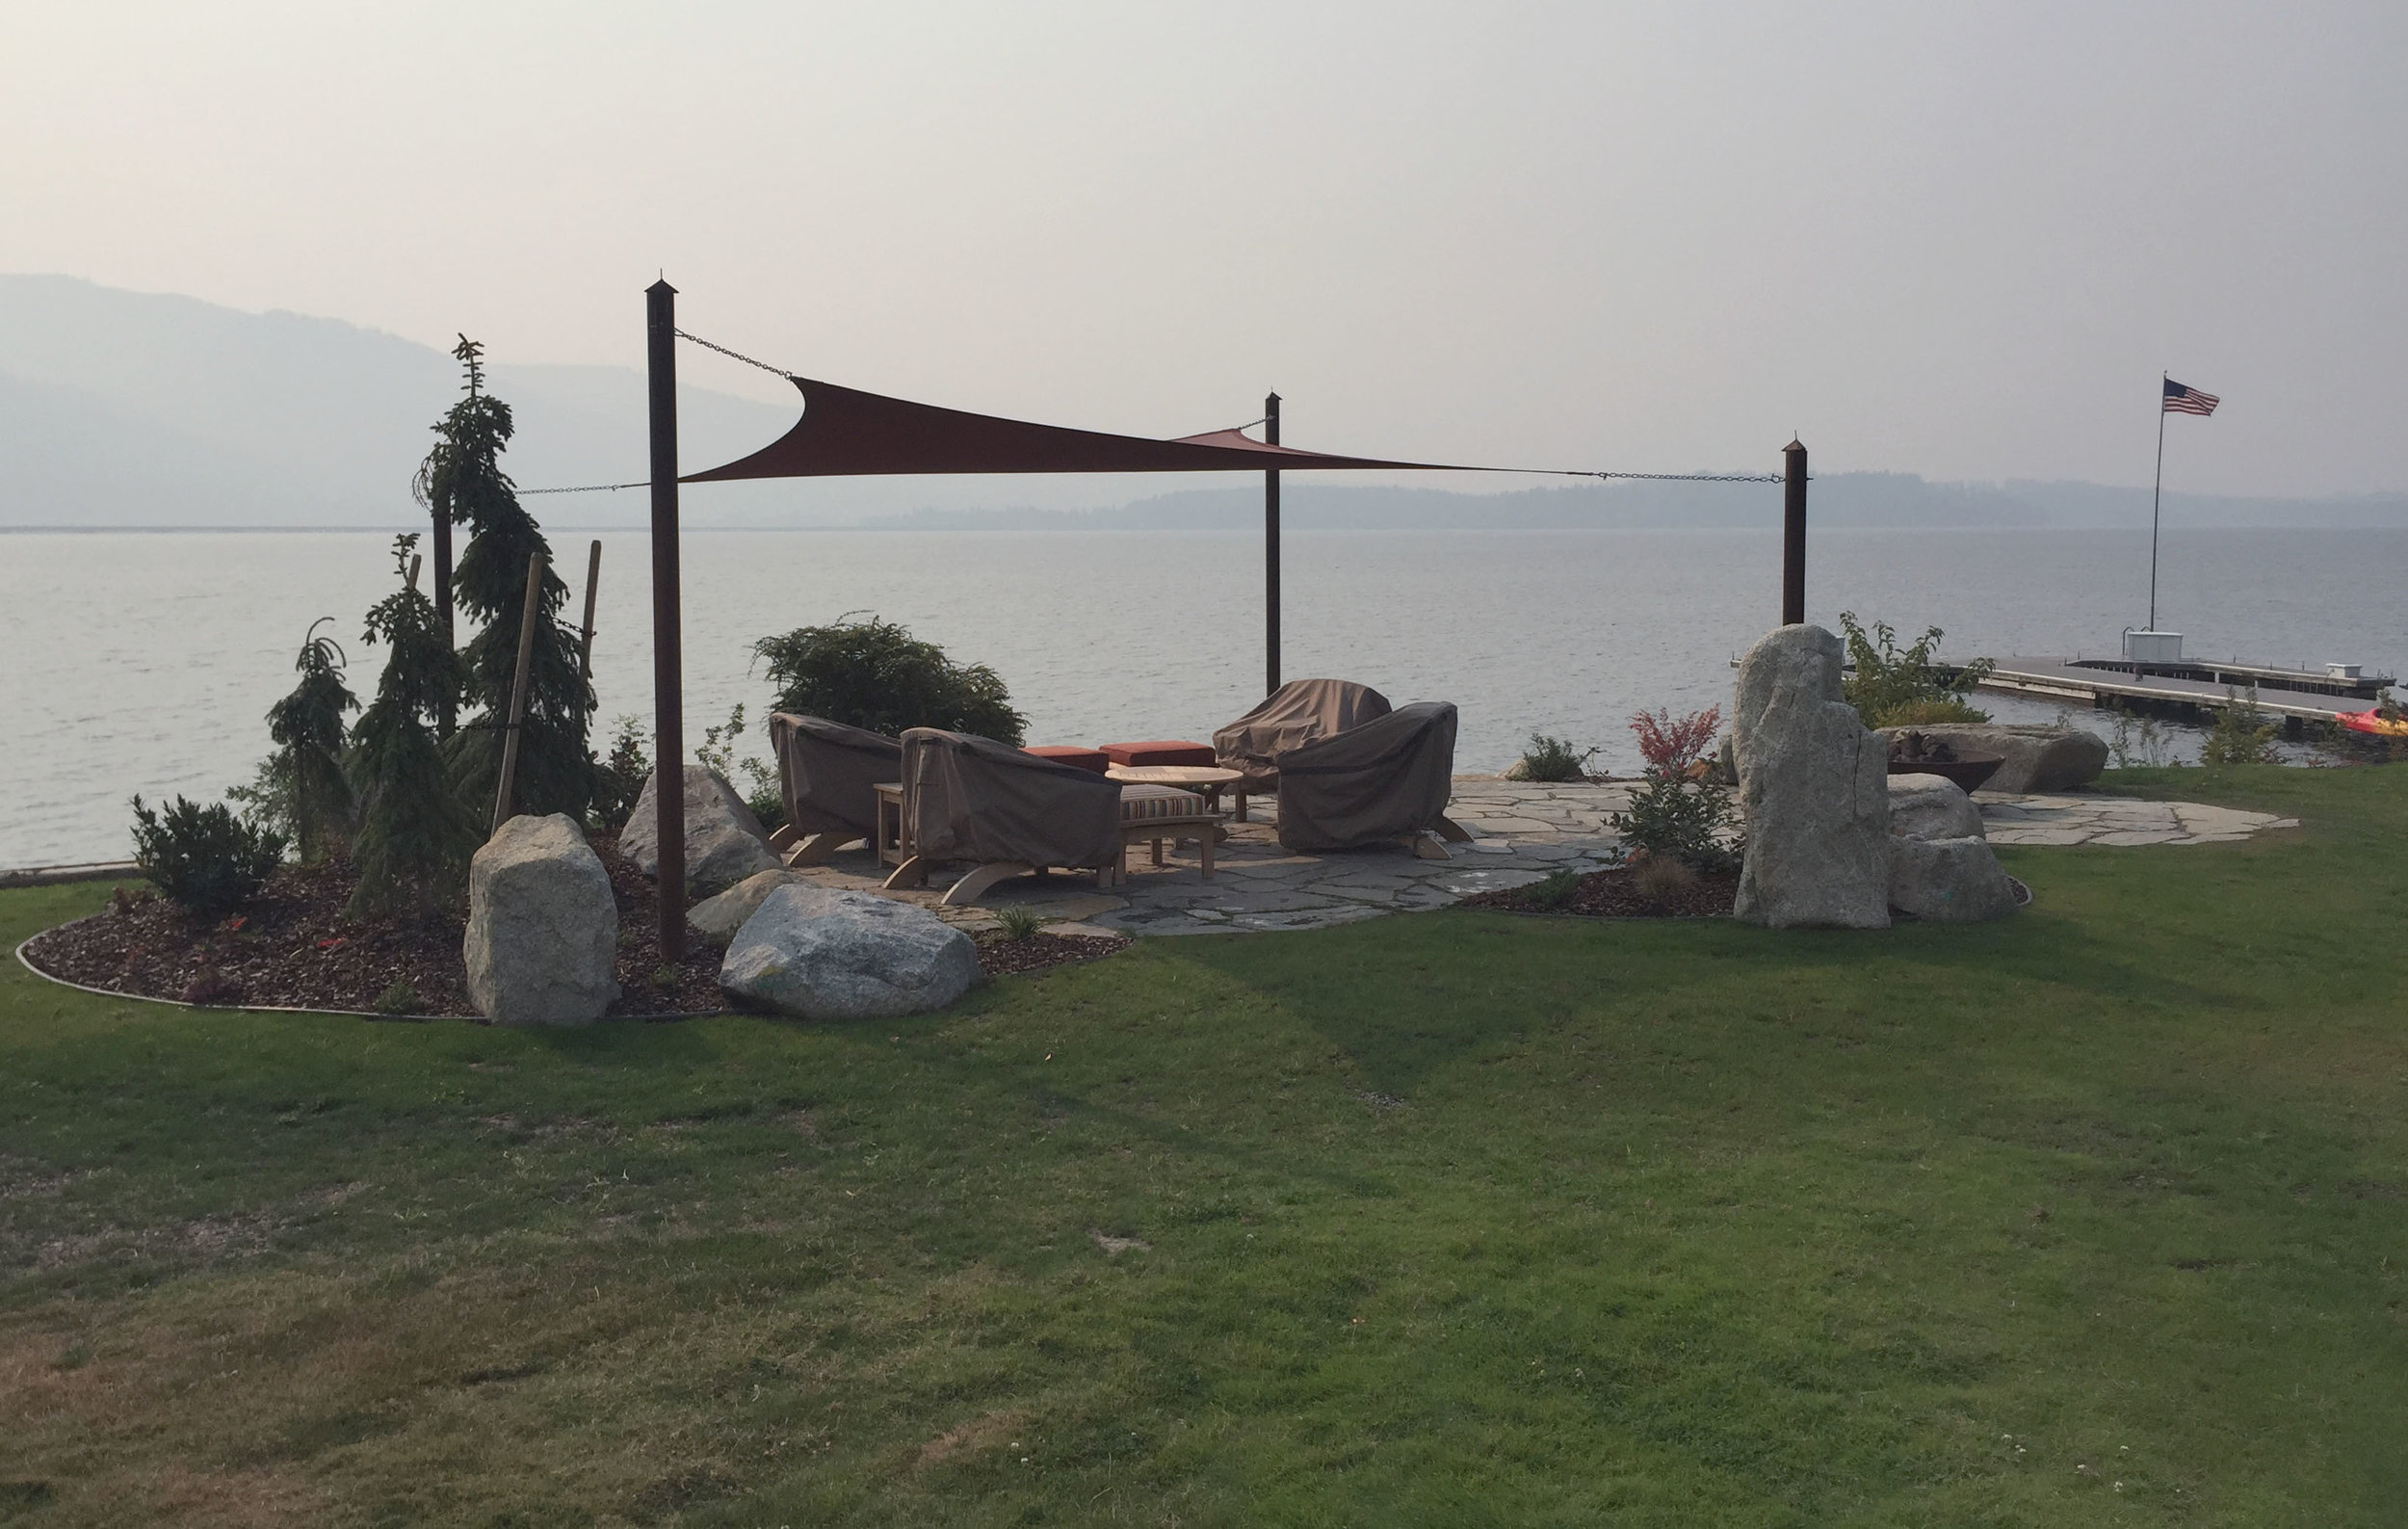 northwest shade sail over patio